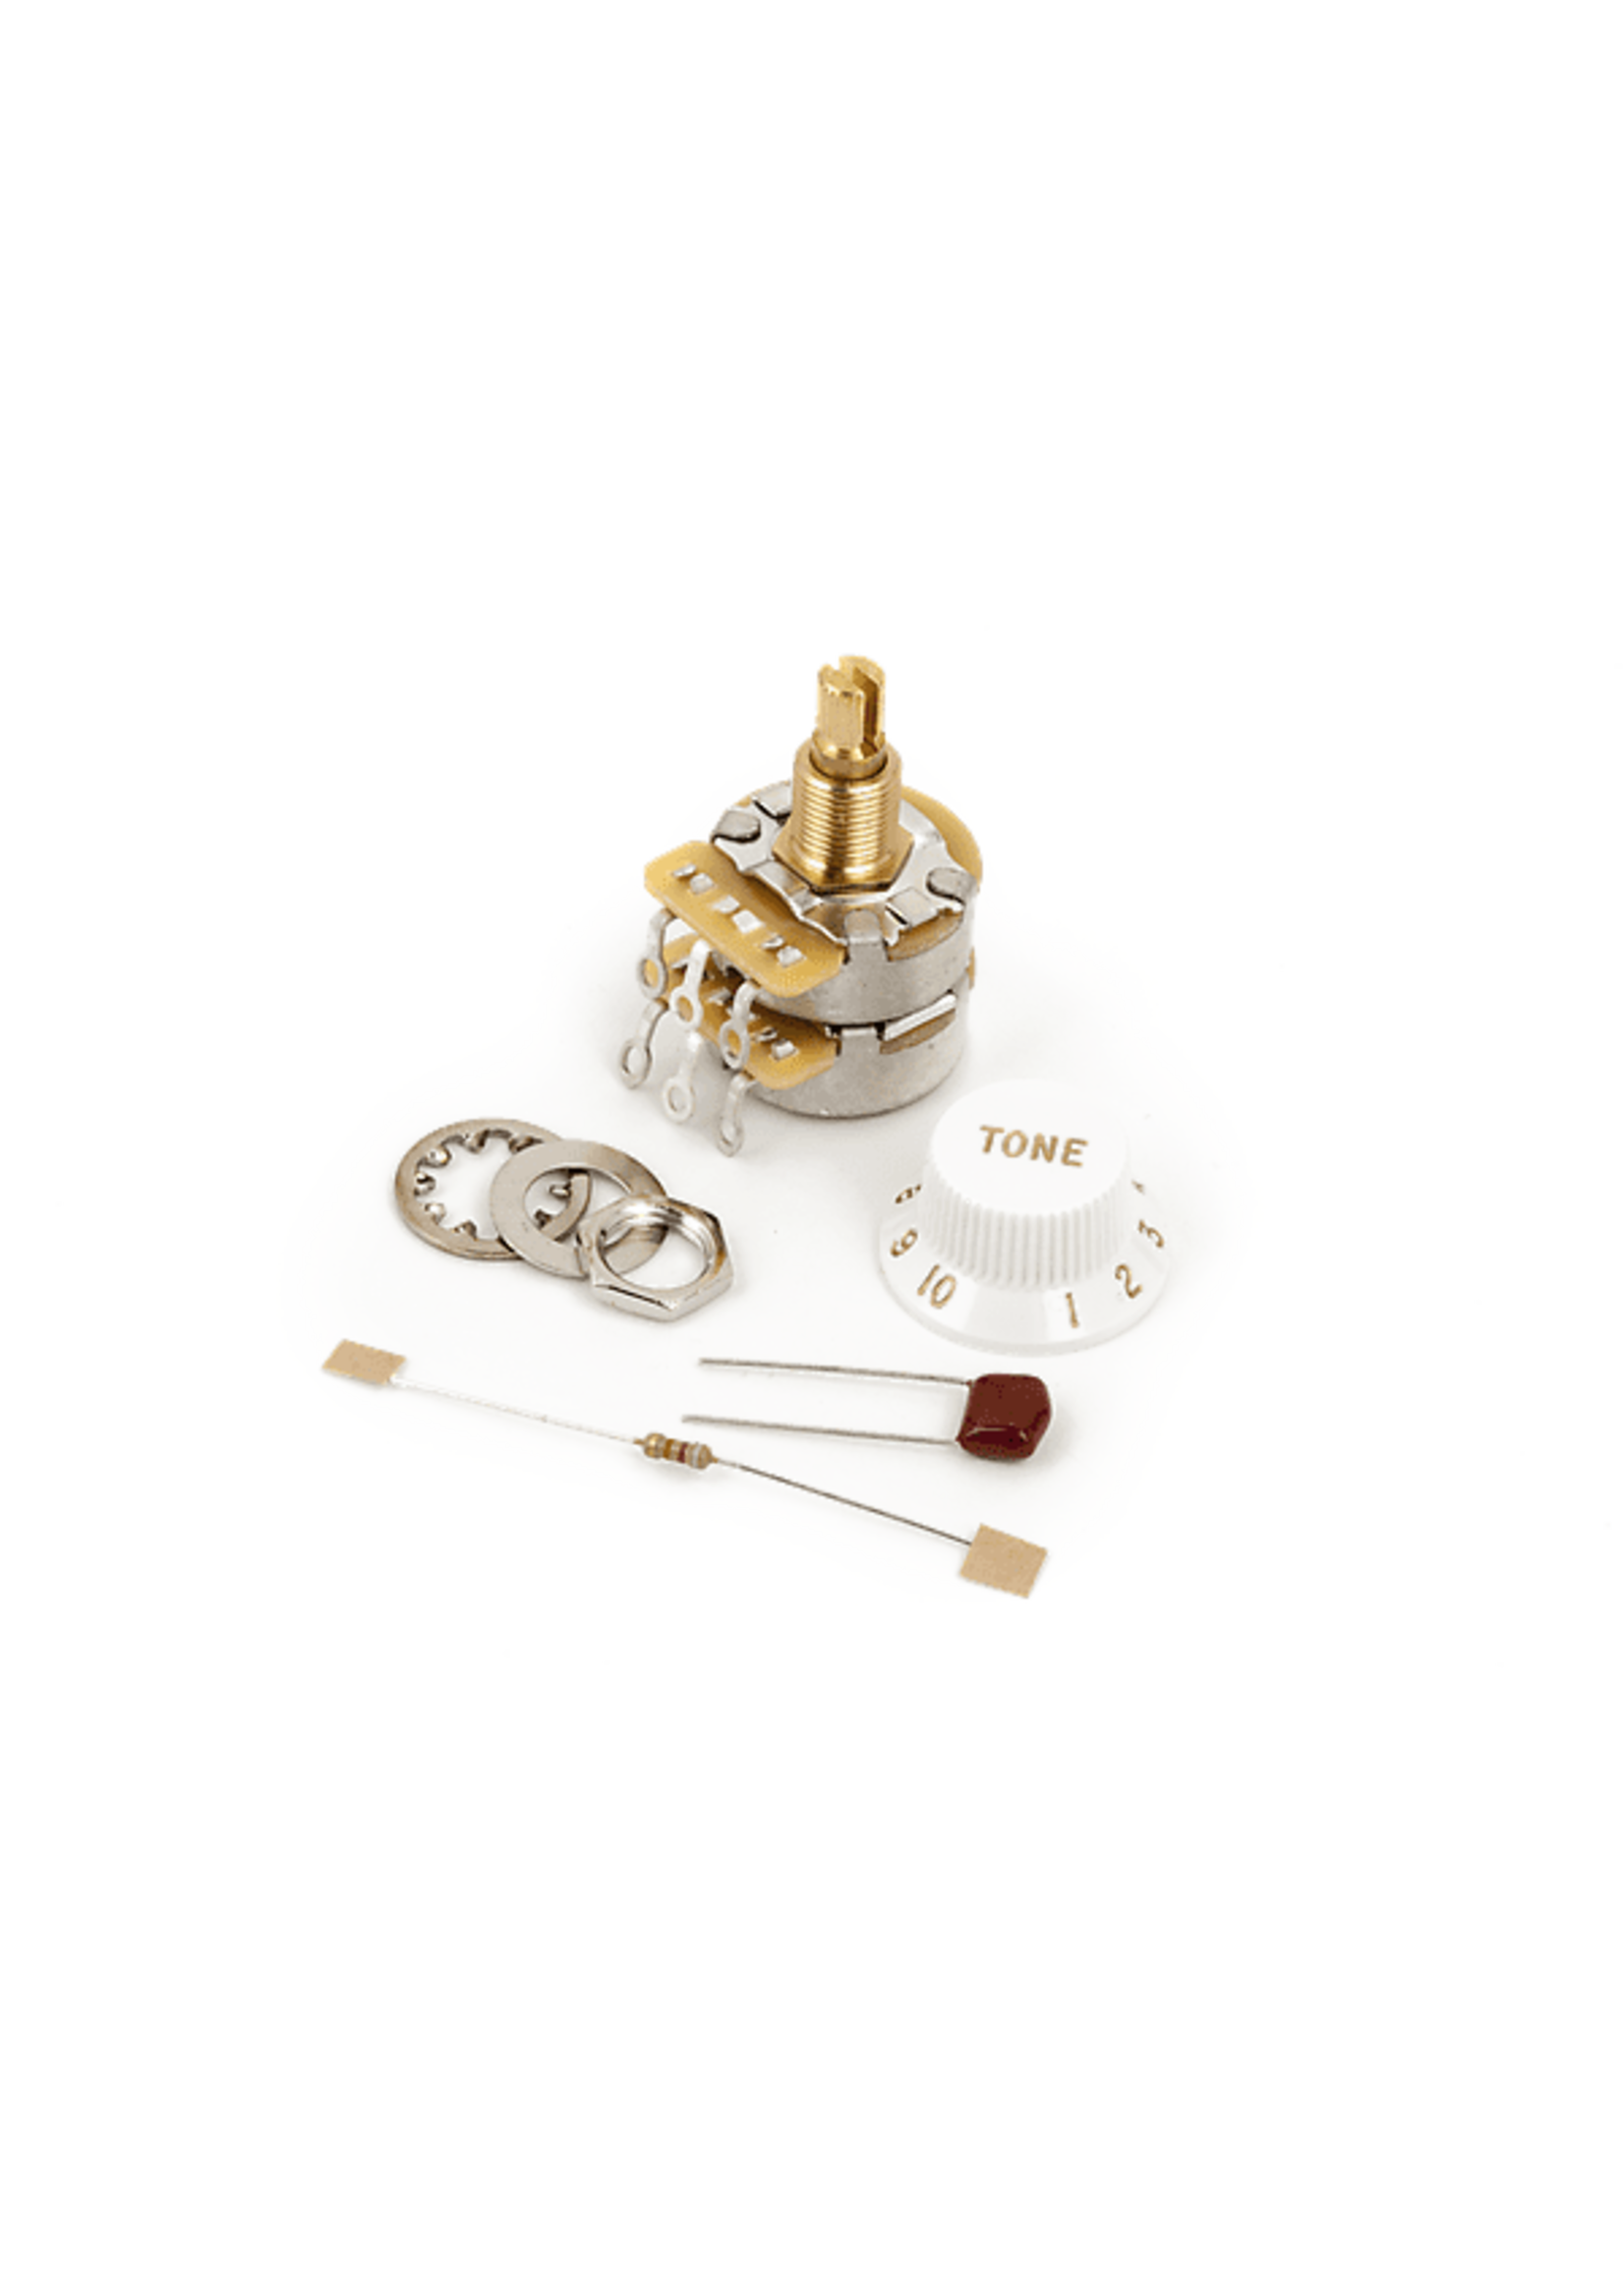 Fender Fender TBX (Treble Bass Expander) Tone Control Potentiometer Kit